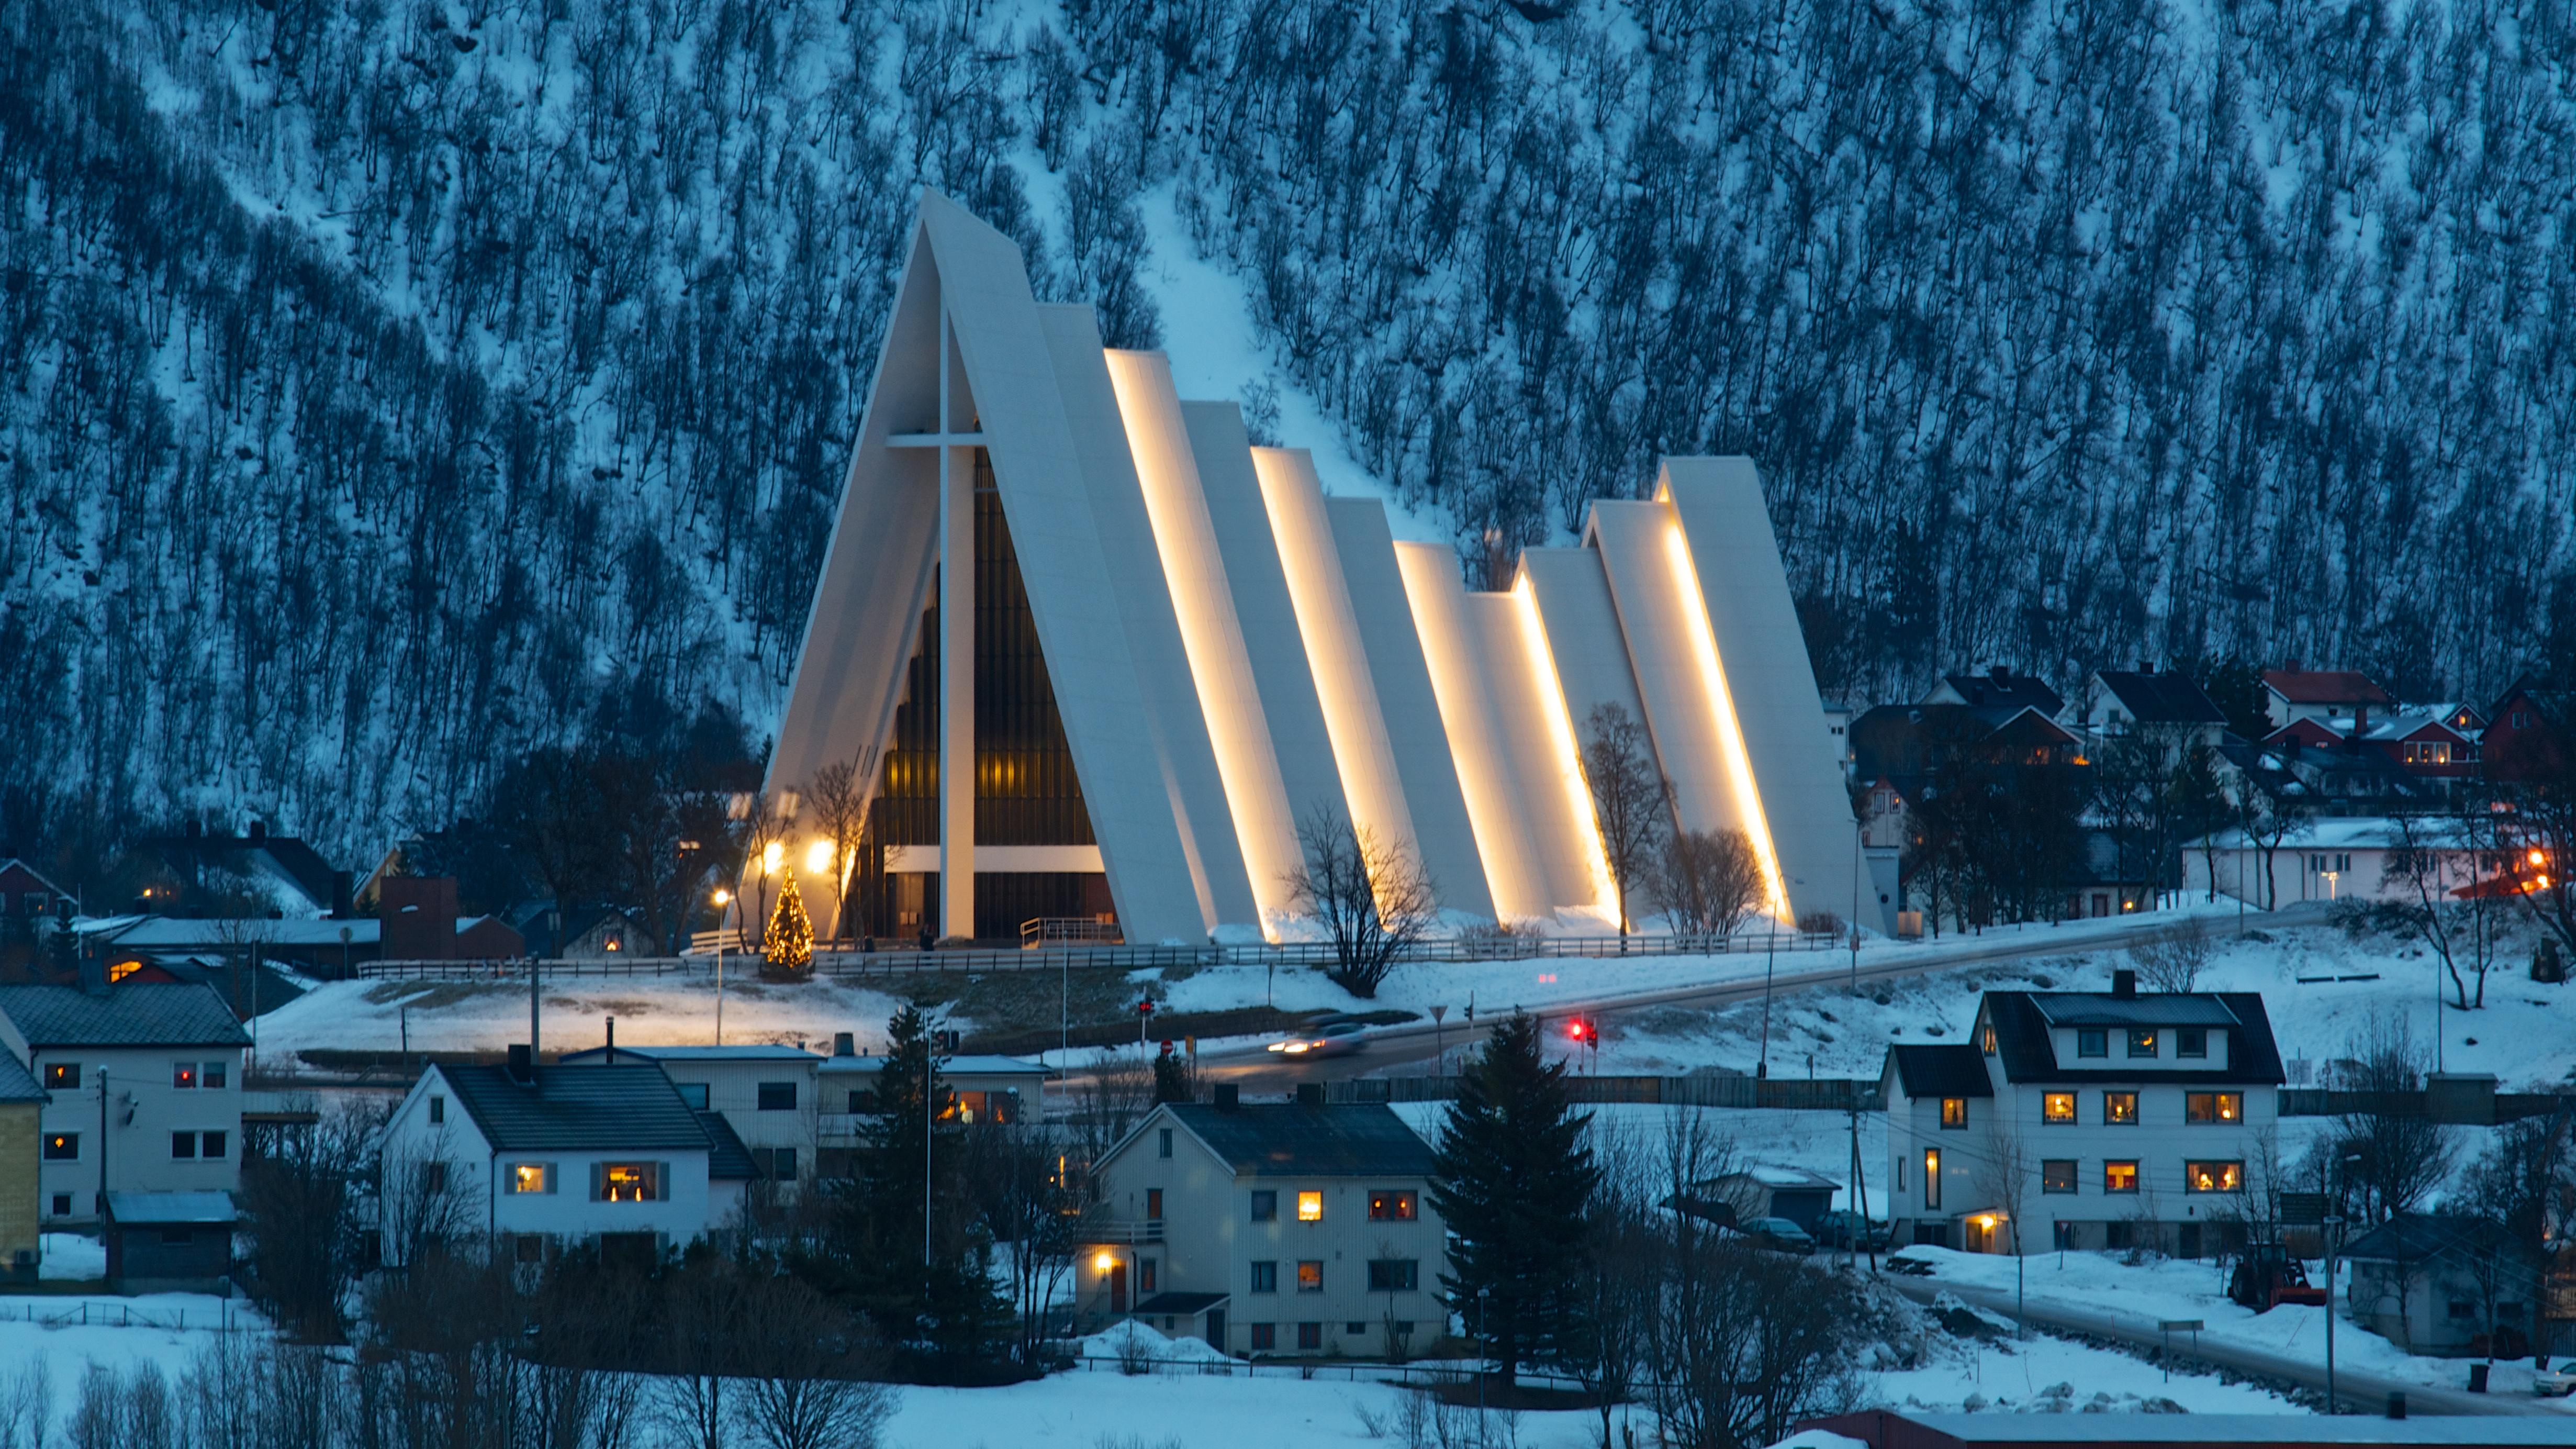 Arctic_Cathedral_-_Tromso